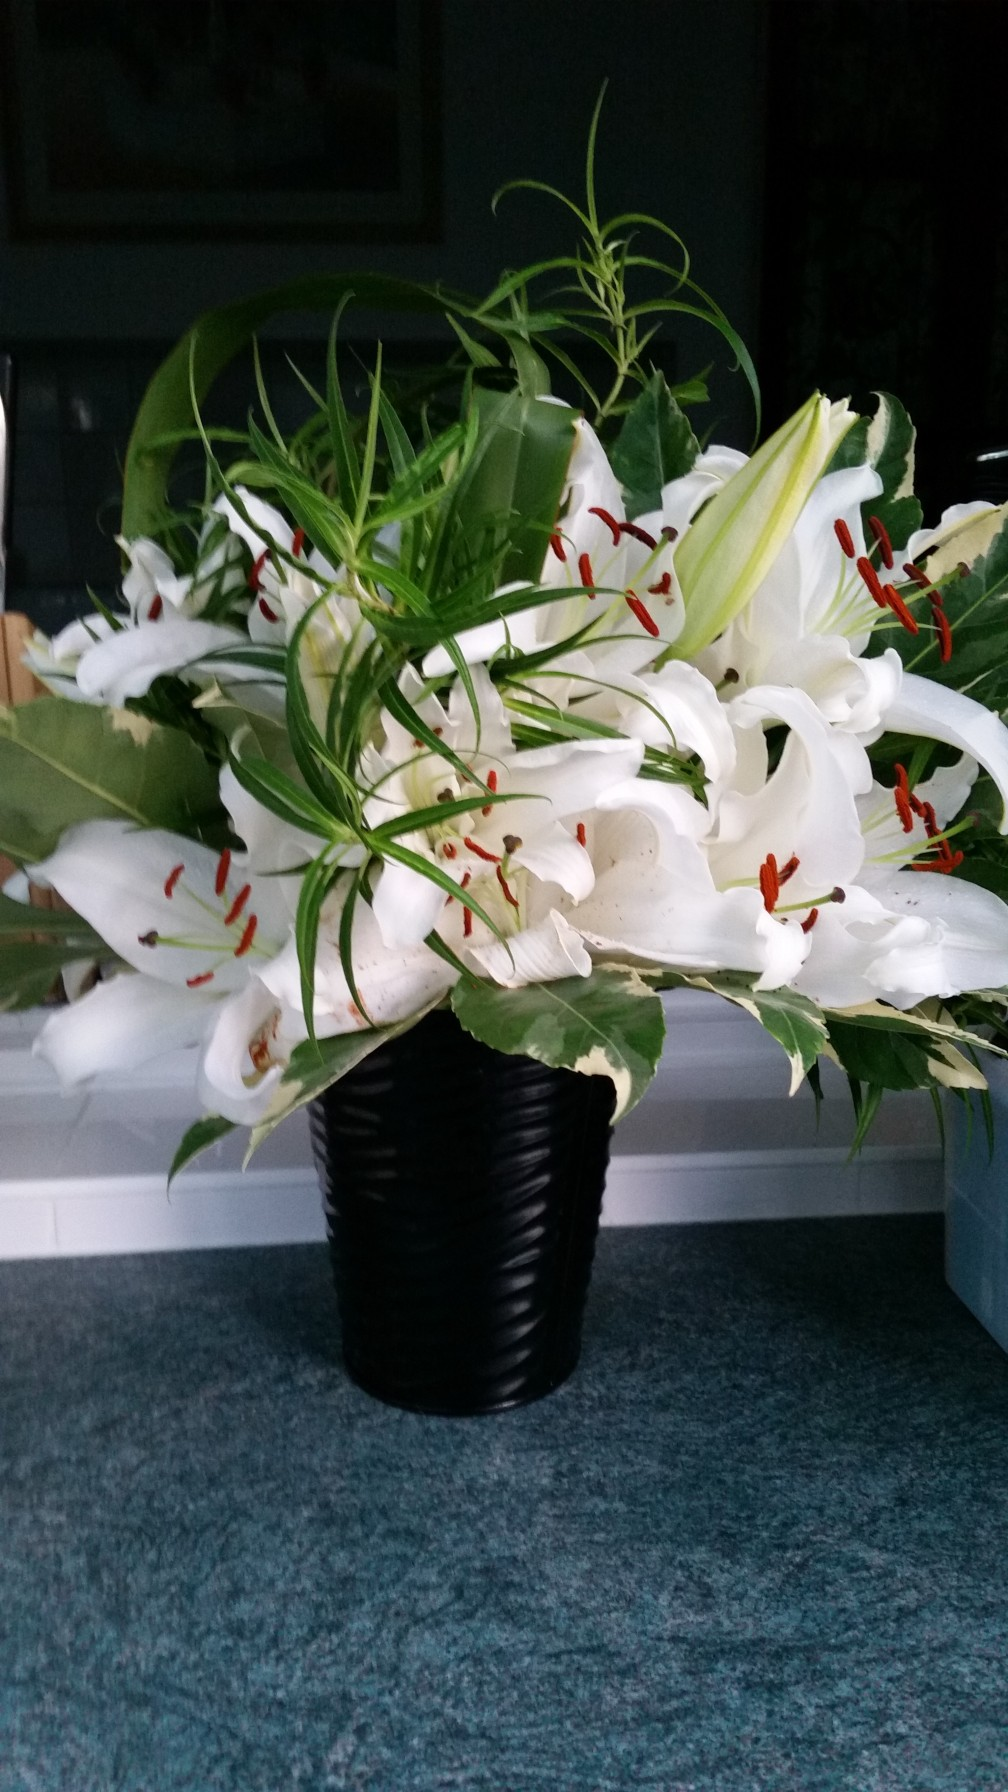 151105 - Flowers